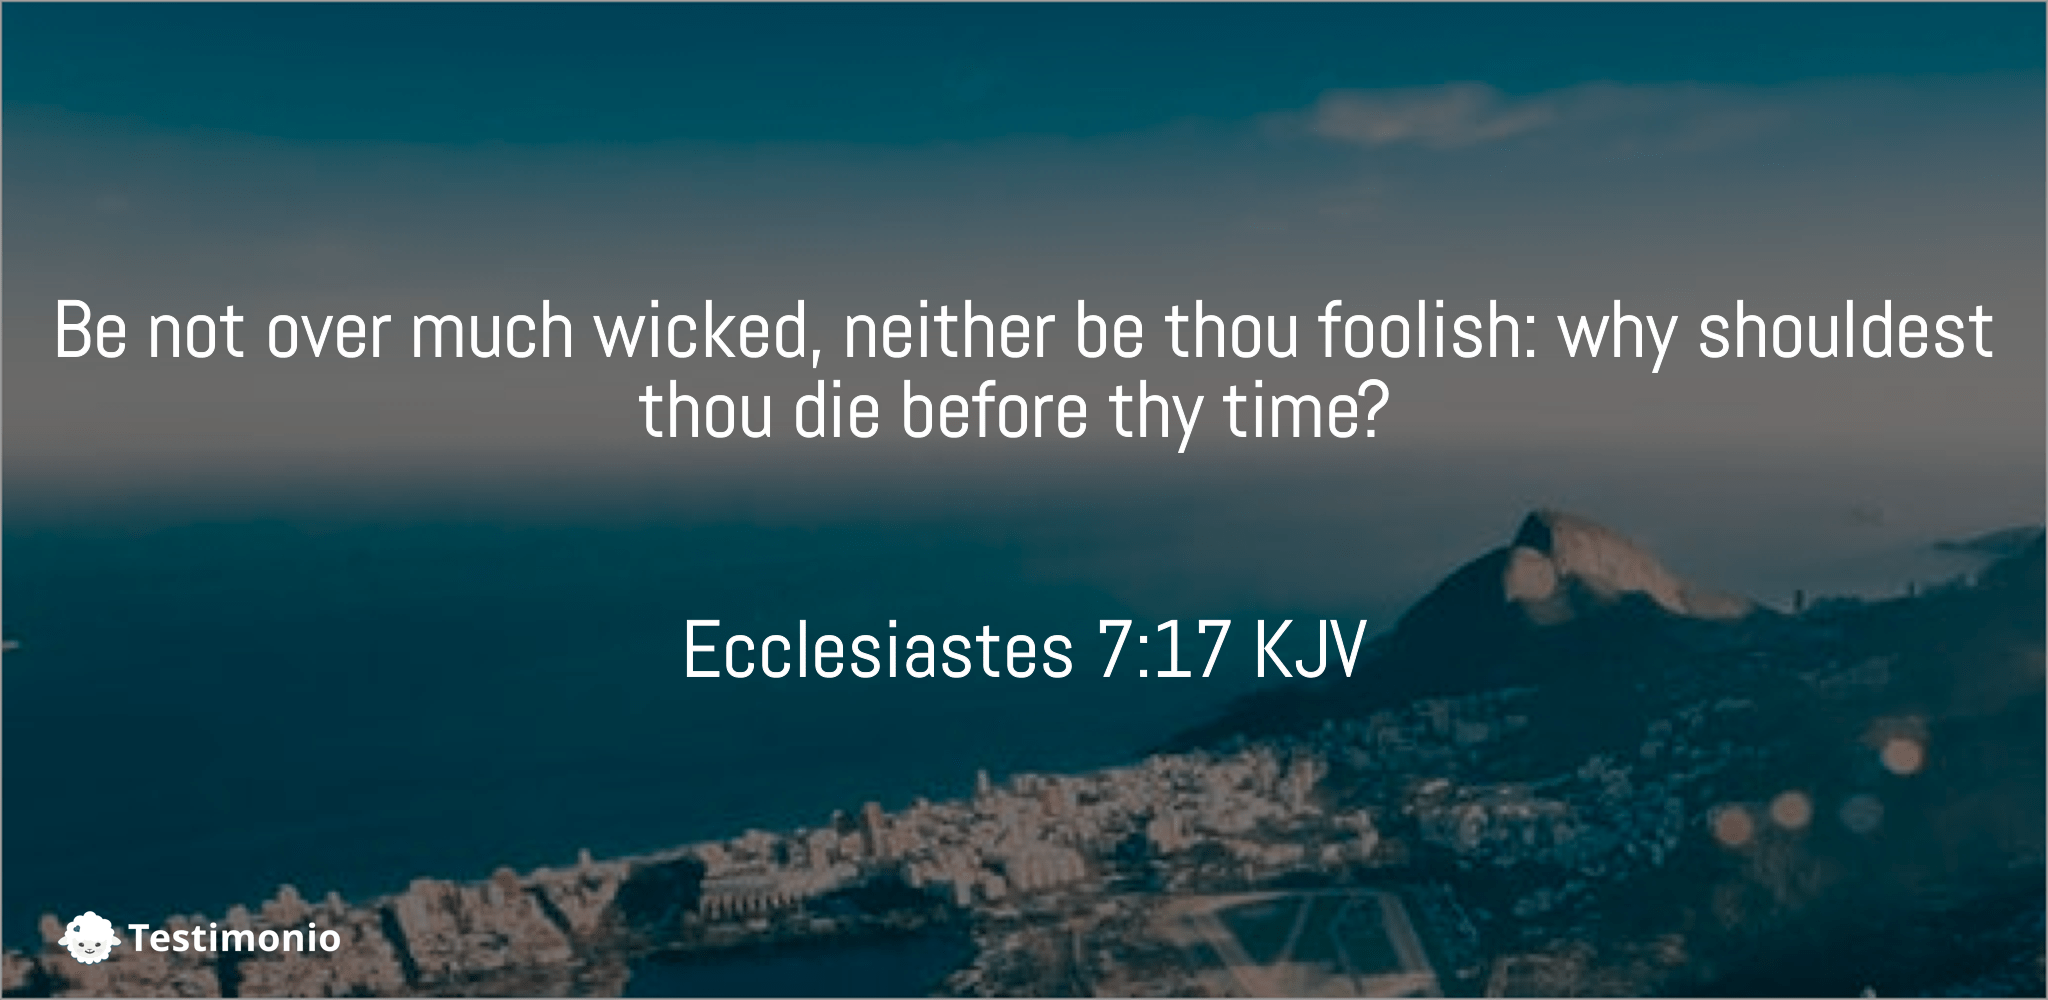 Ecclesiastes 7:17